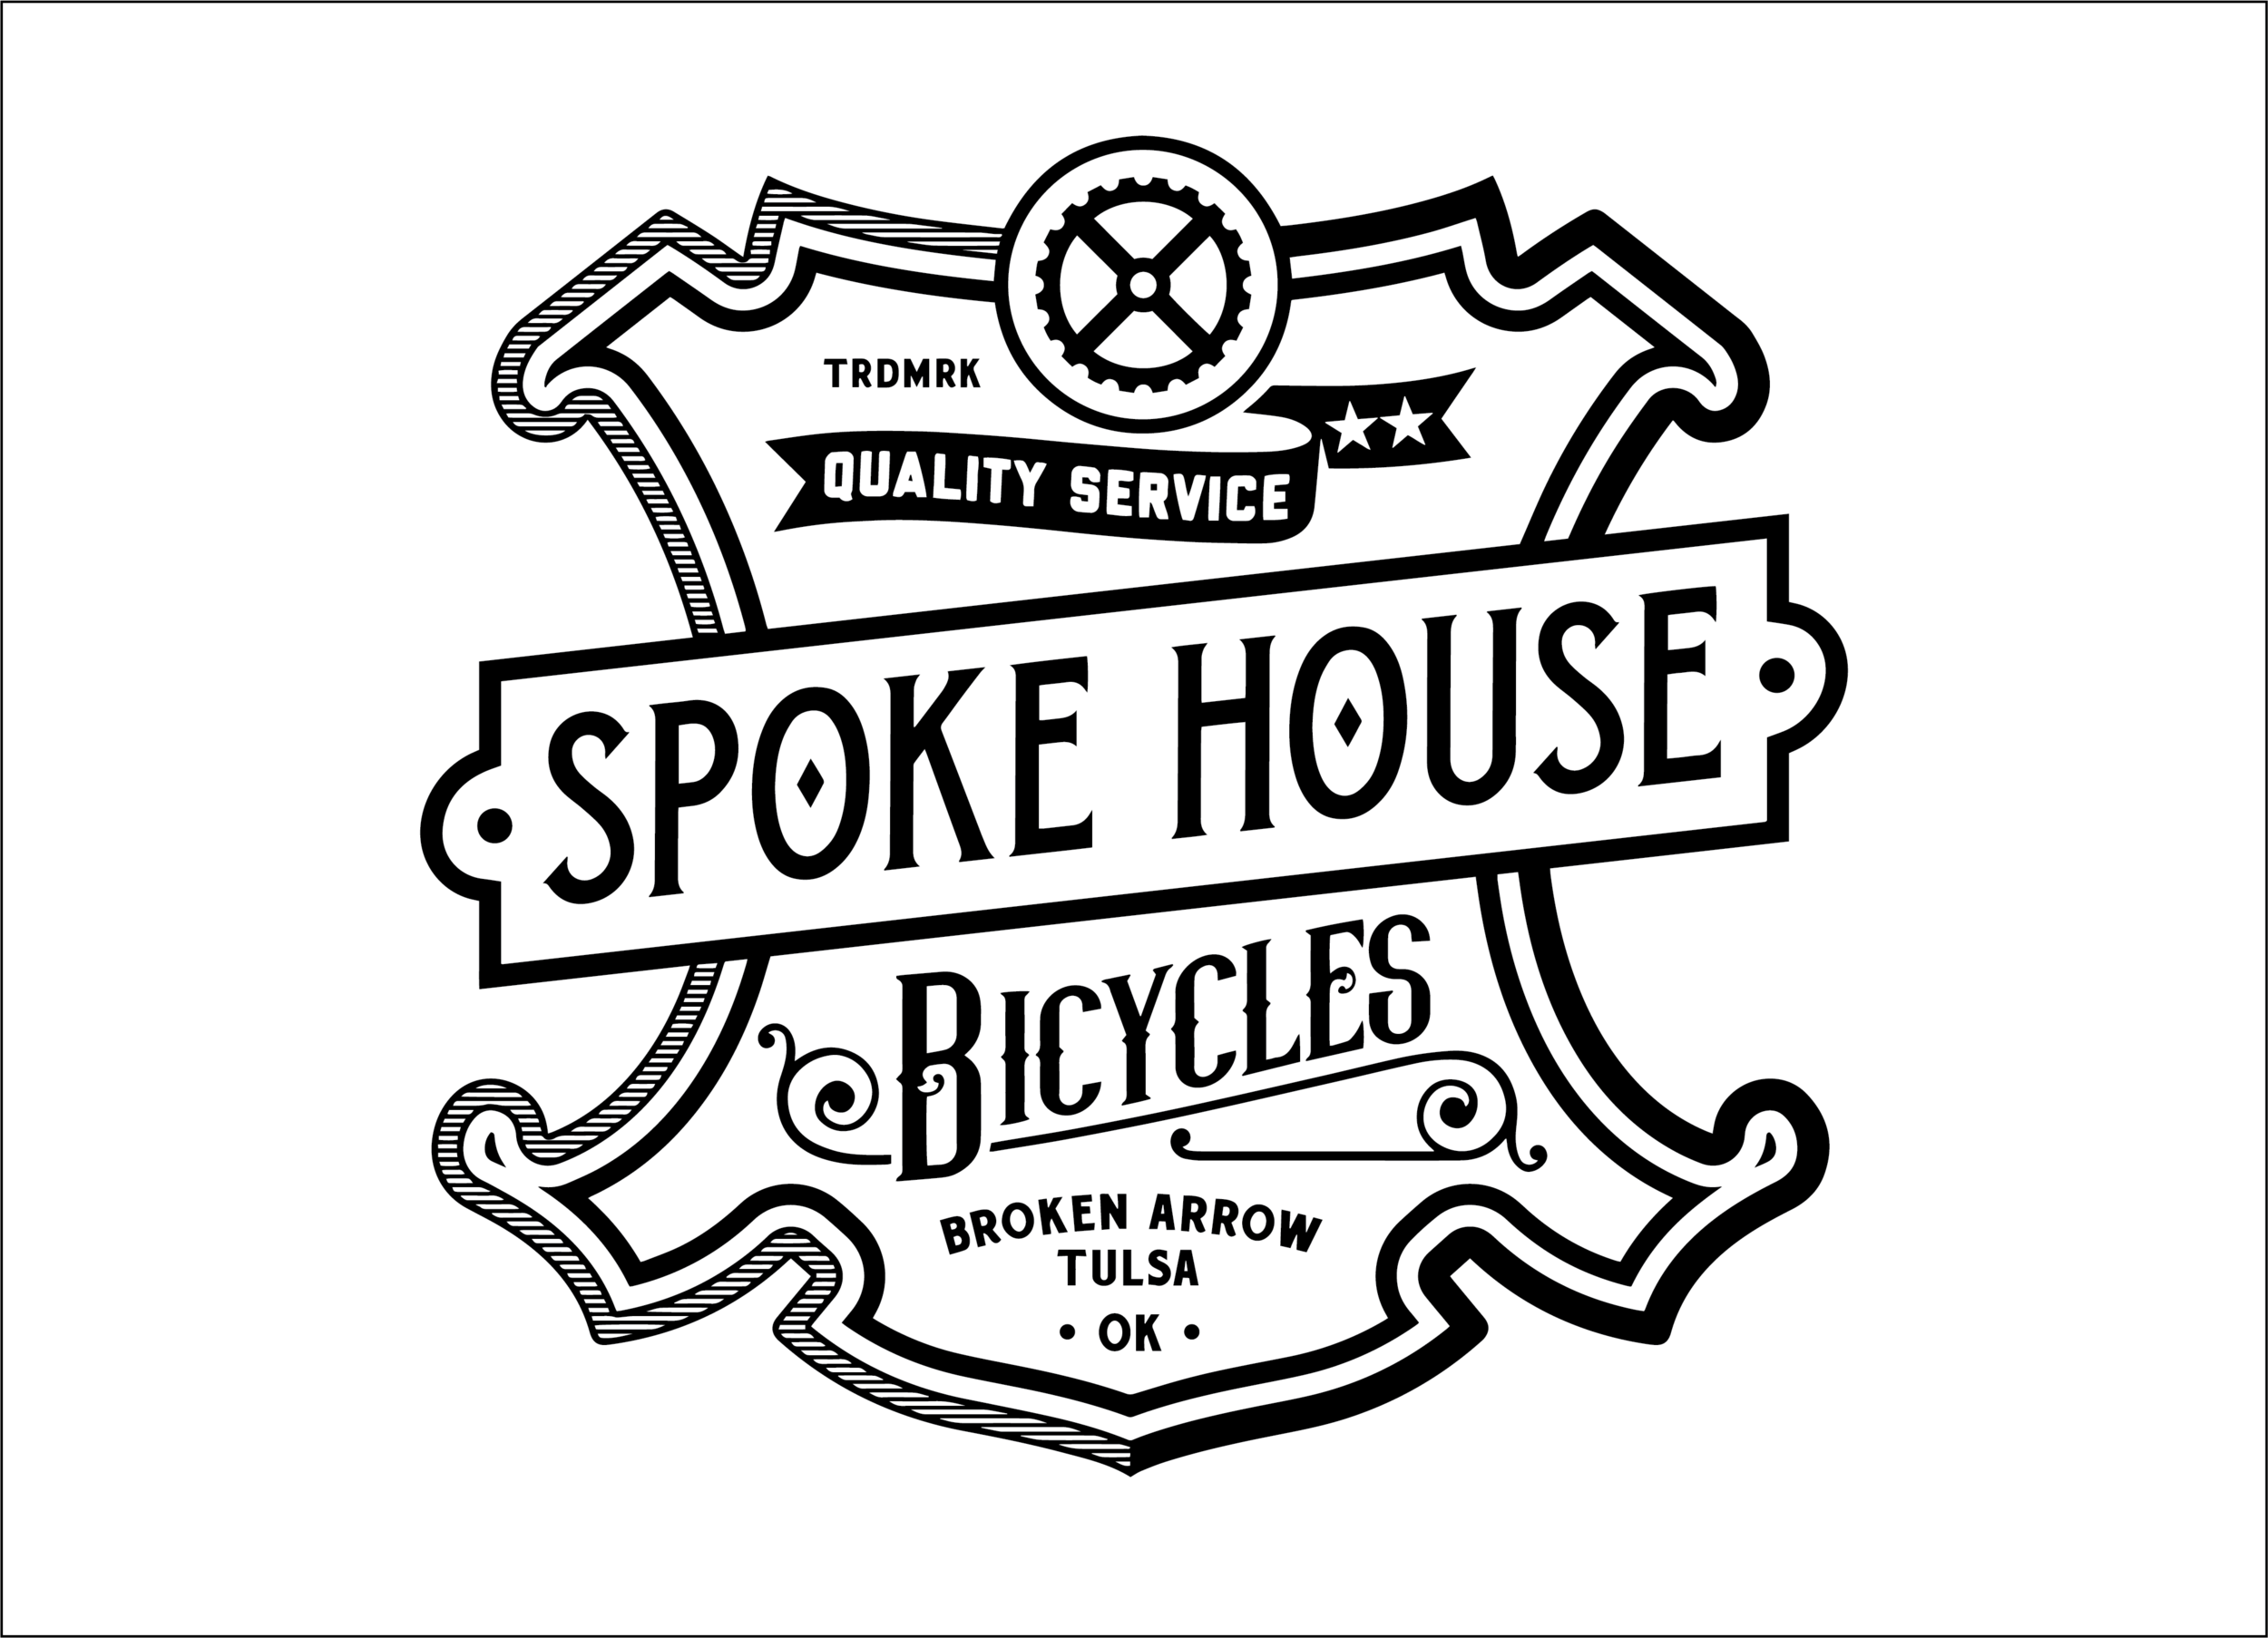 Spoke_House_New_2017_White_Back.png